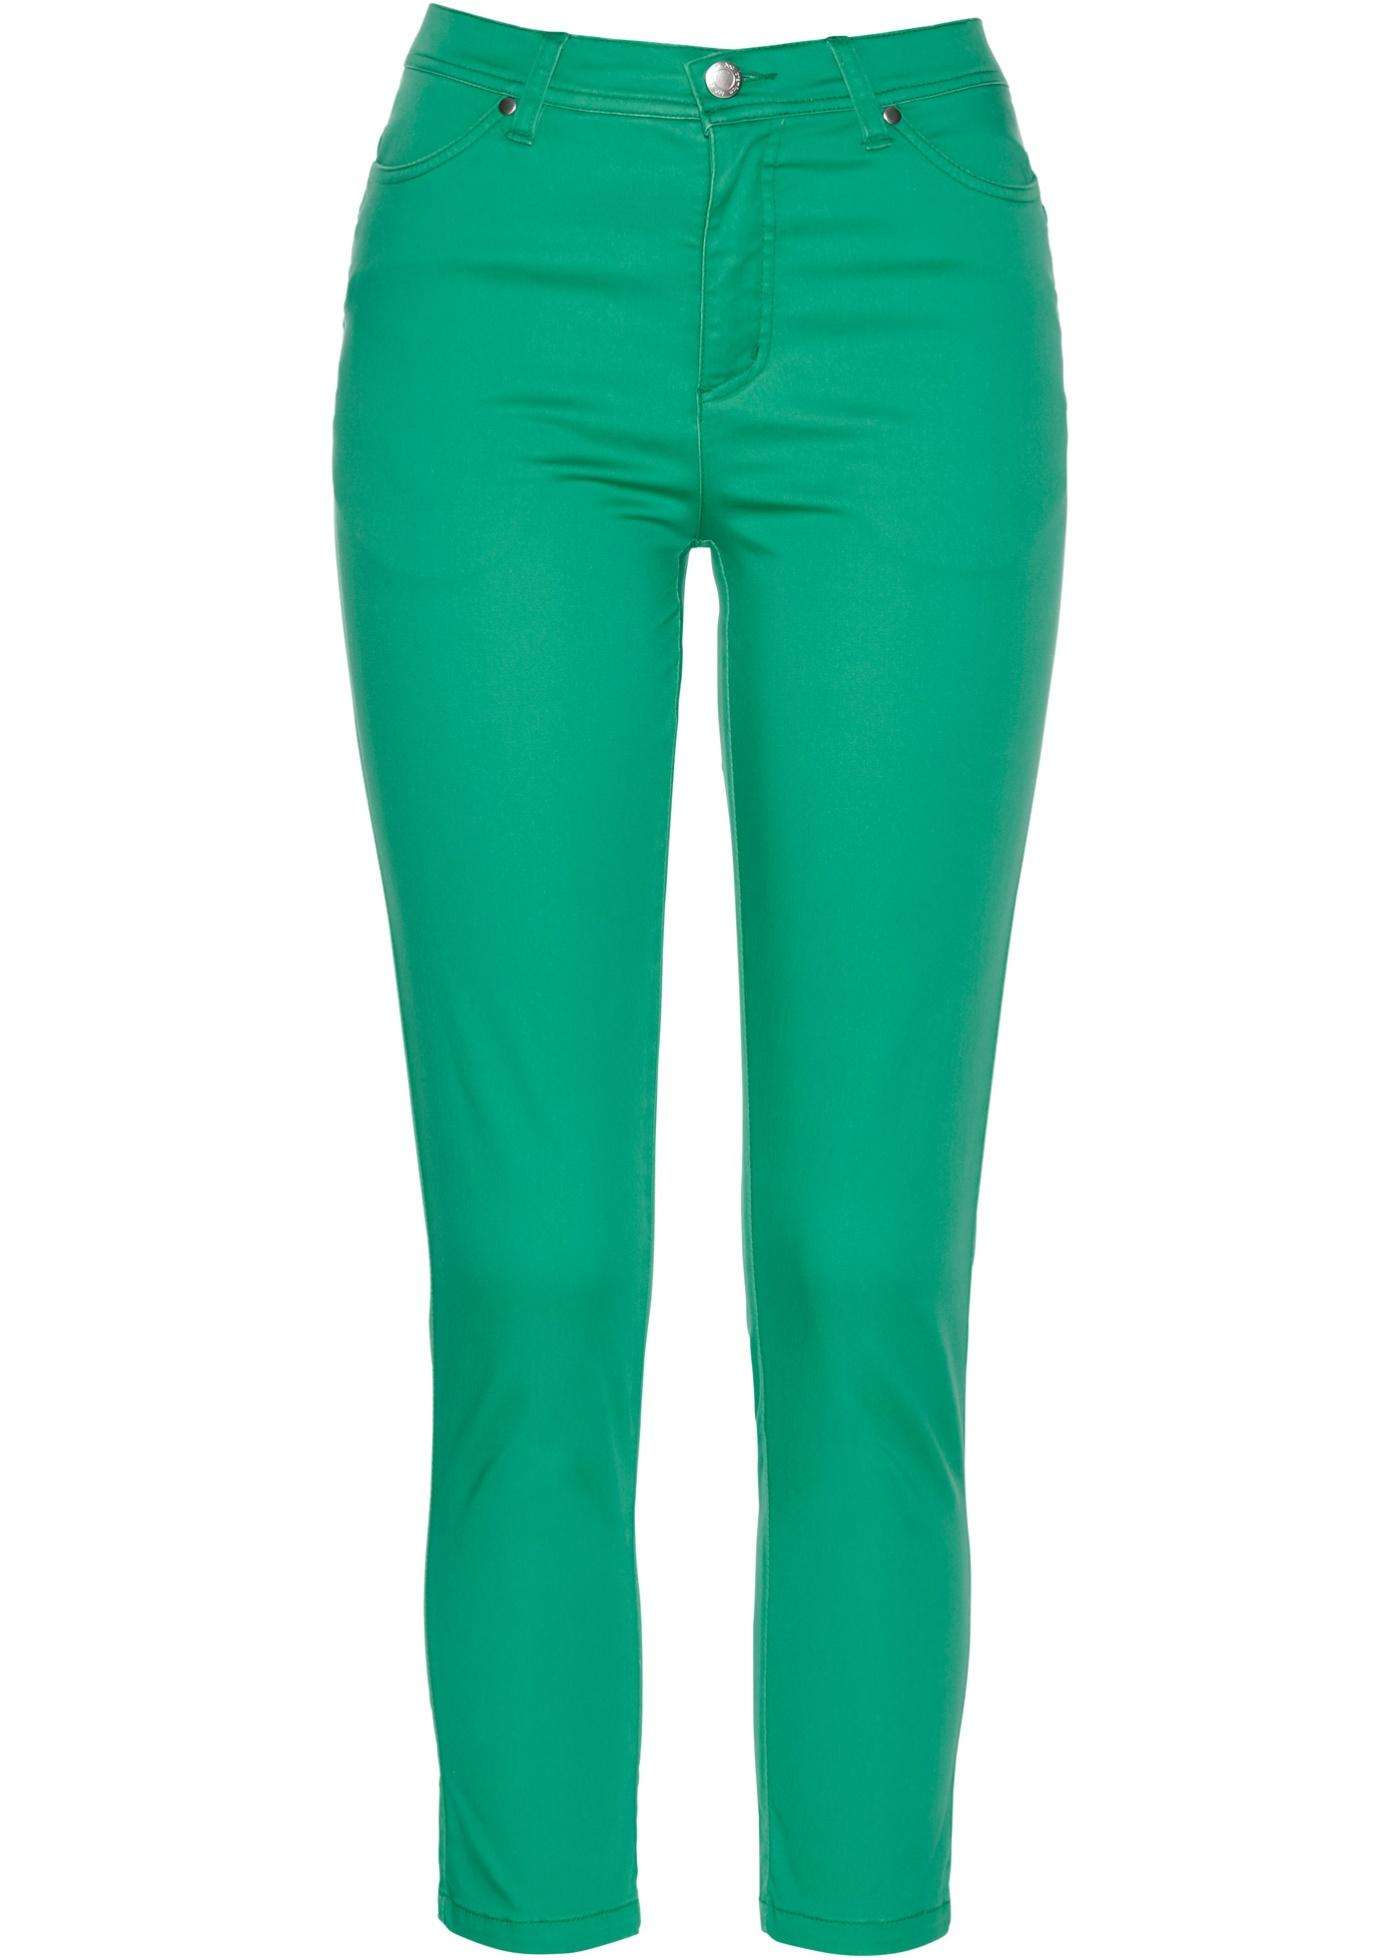 Hosen - Premium Komfort Stretchhose › bonprix › grün  - Onlineshop Bonprix